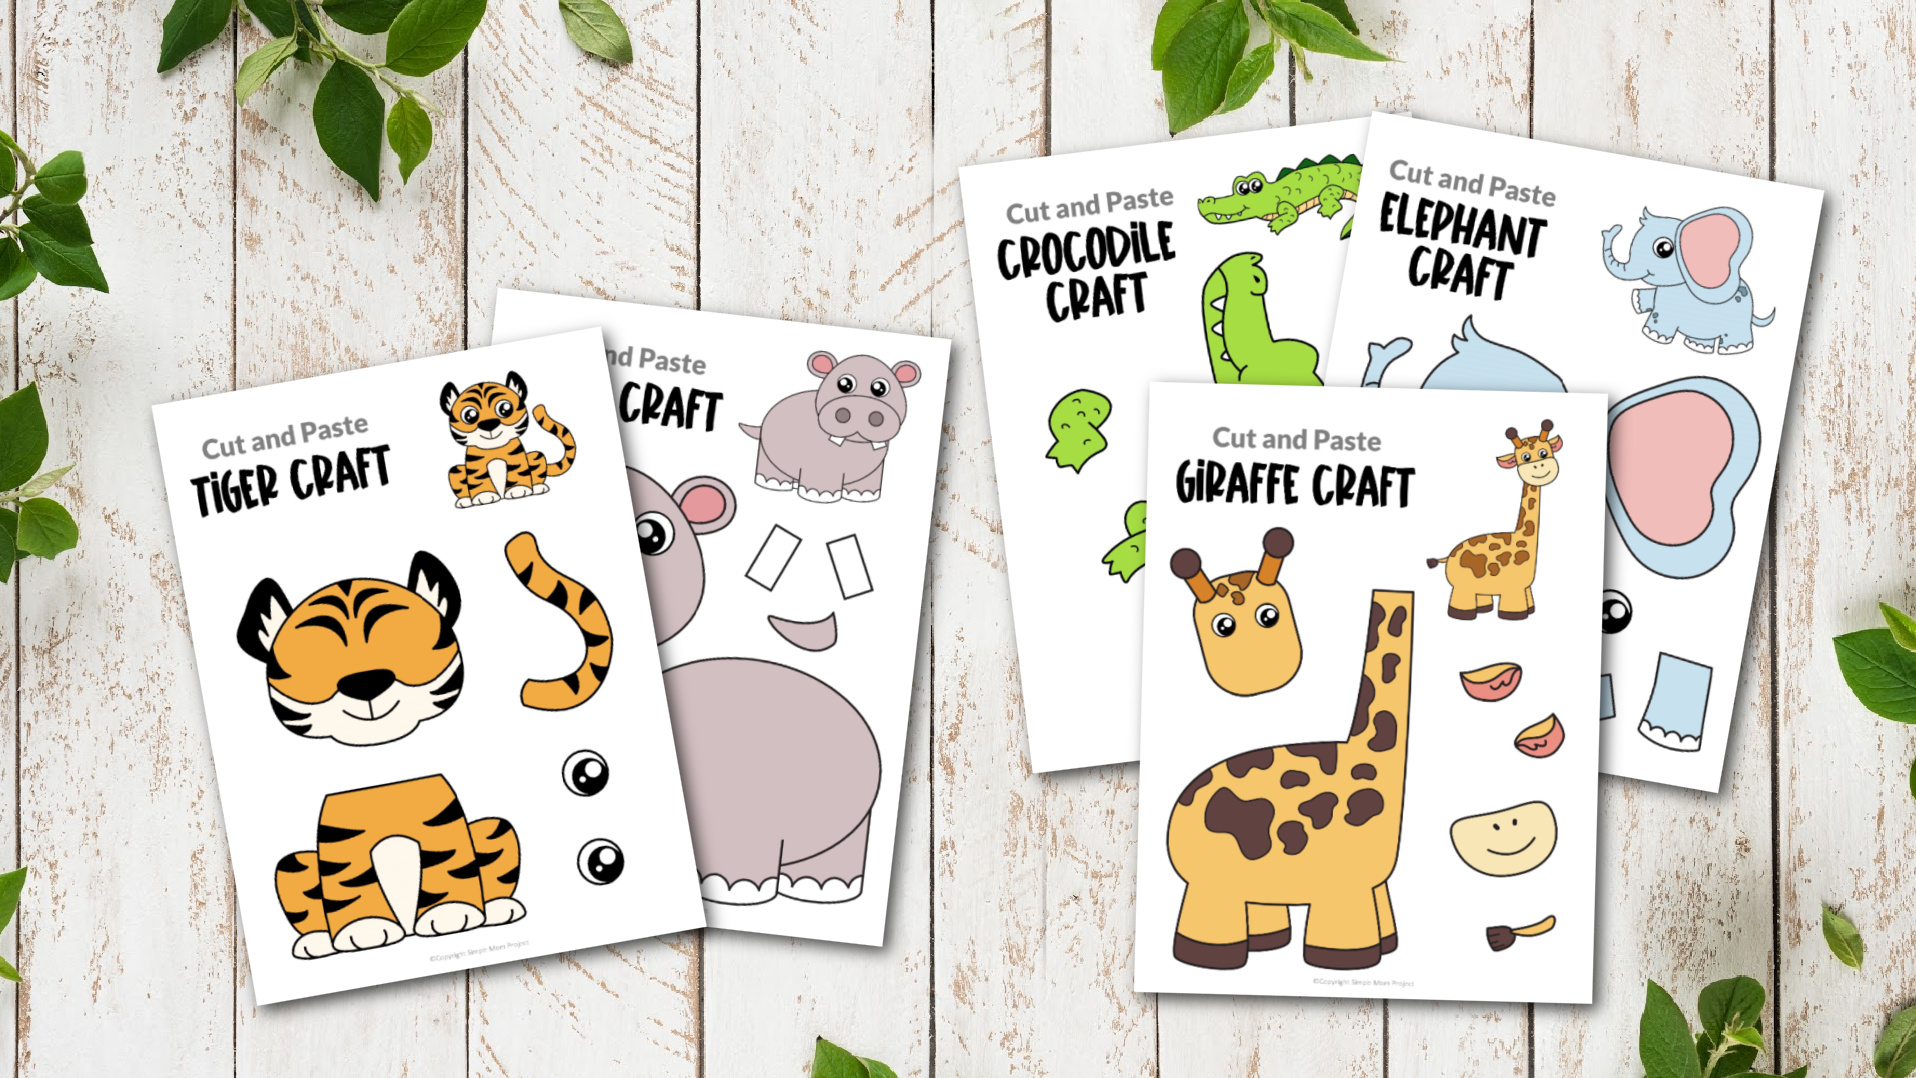 Printable Safari Jungle Animal Crafts for Kids preschoolers kindergartners and toddlers 2